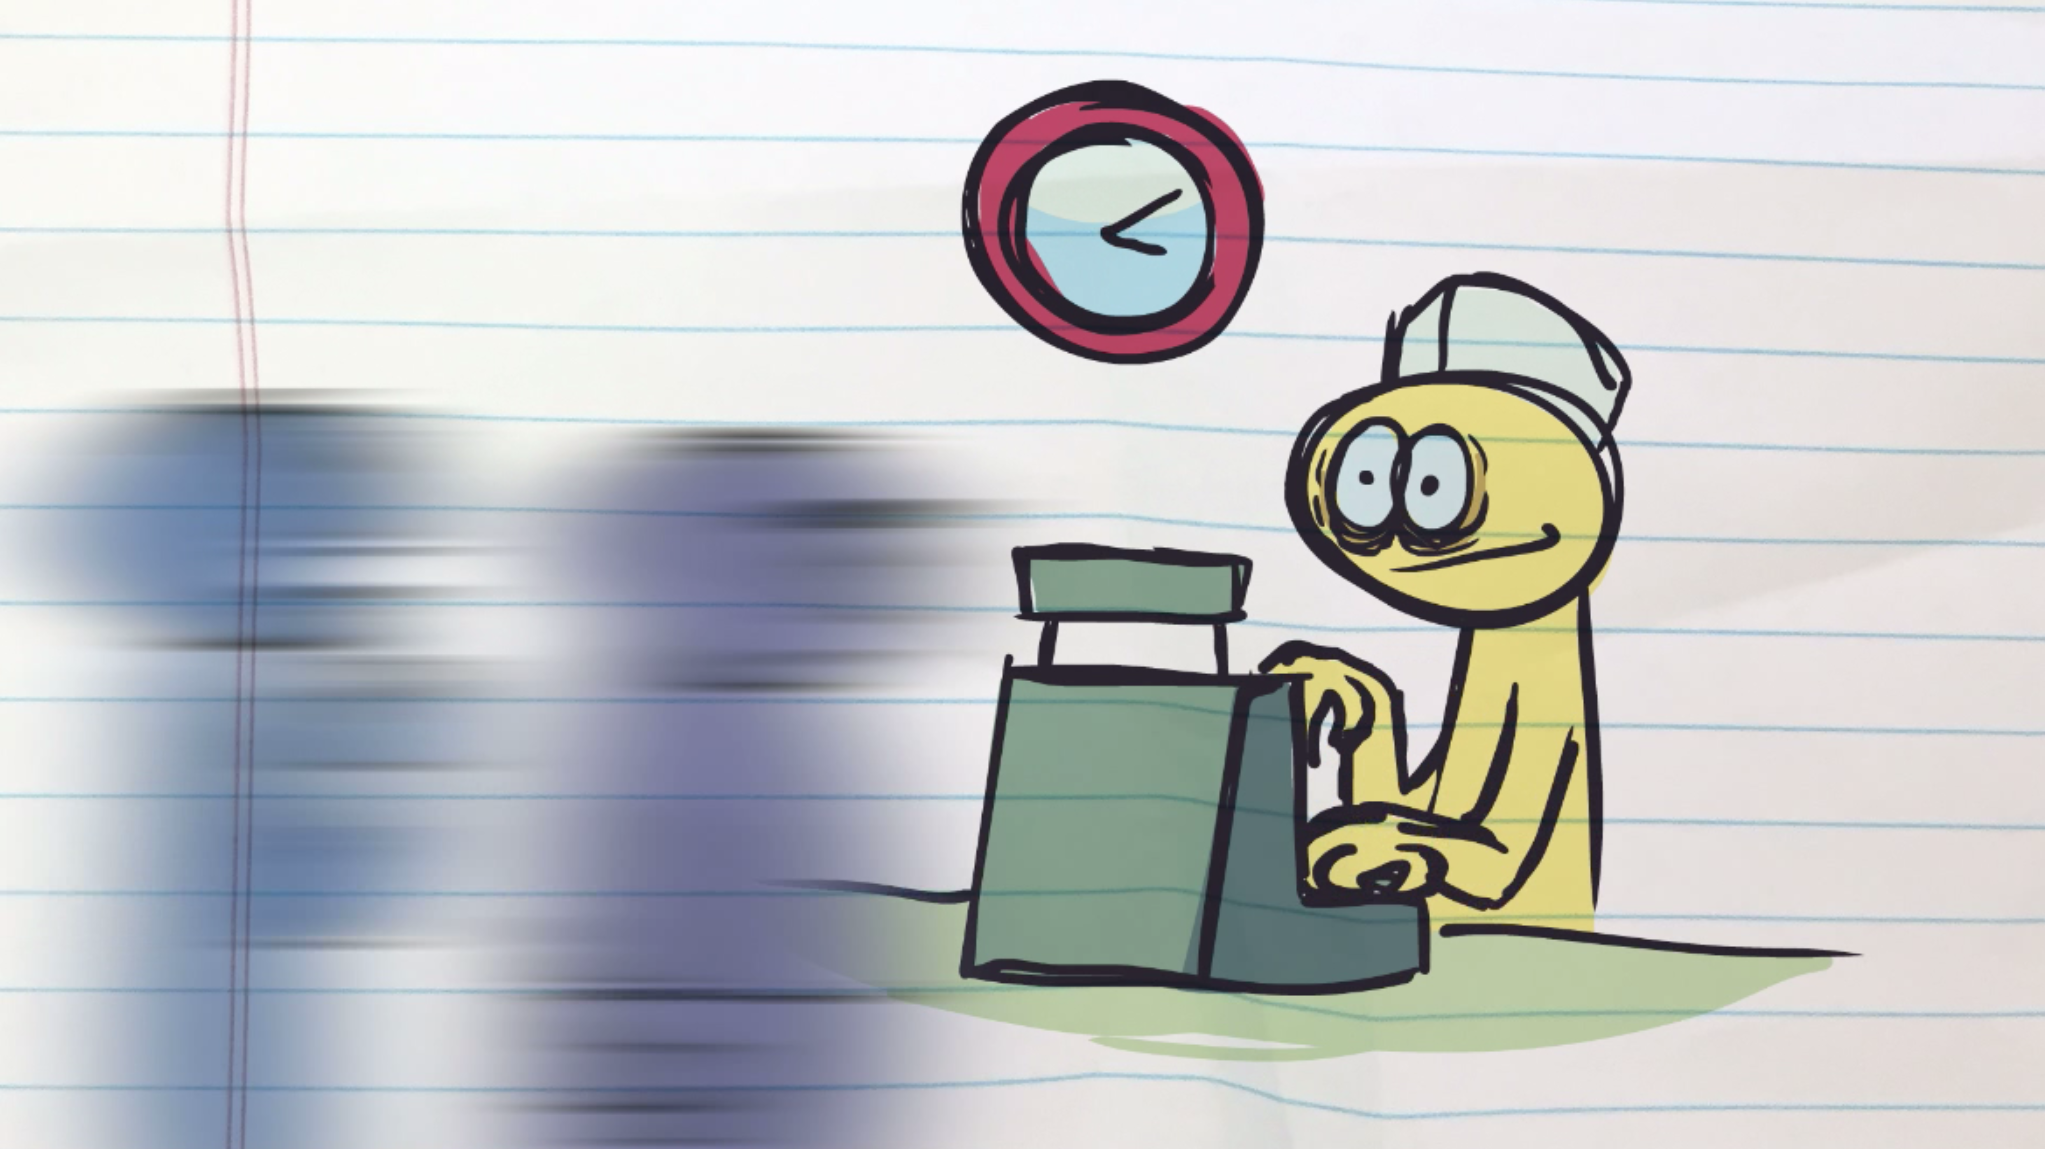 Thankfully, animation work is more rewarding than some alternatives.